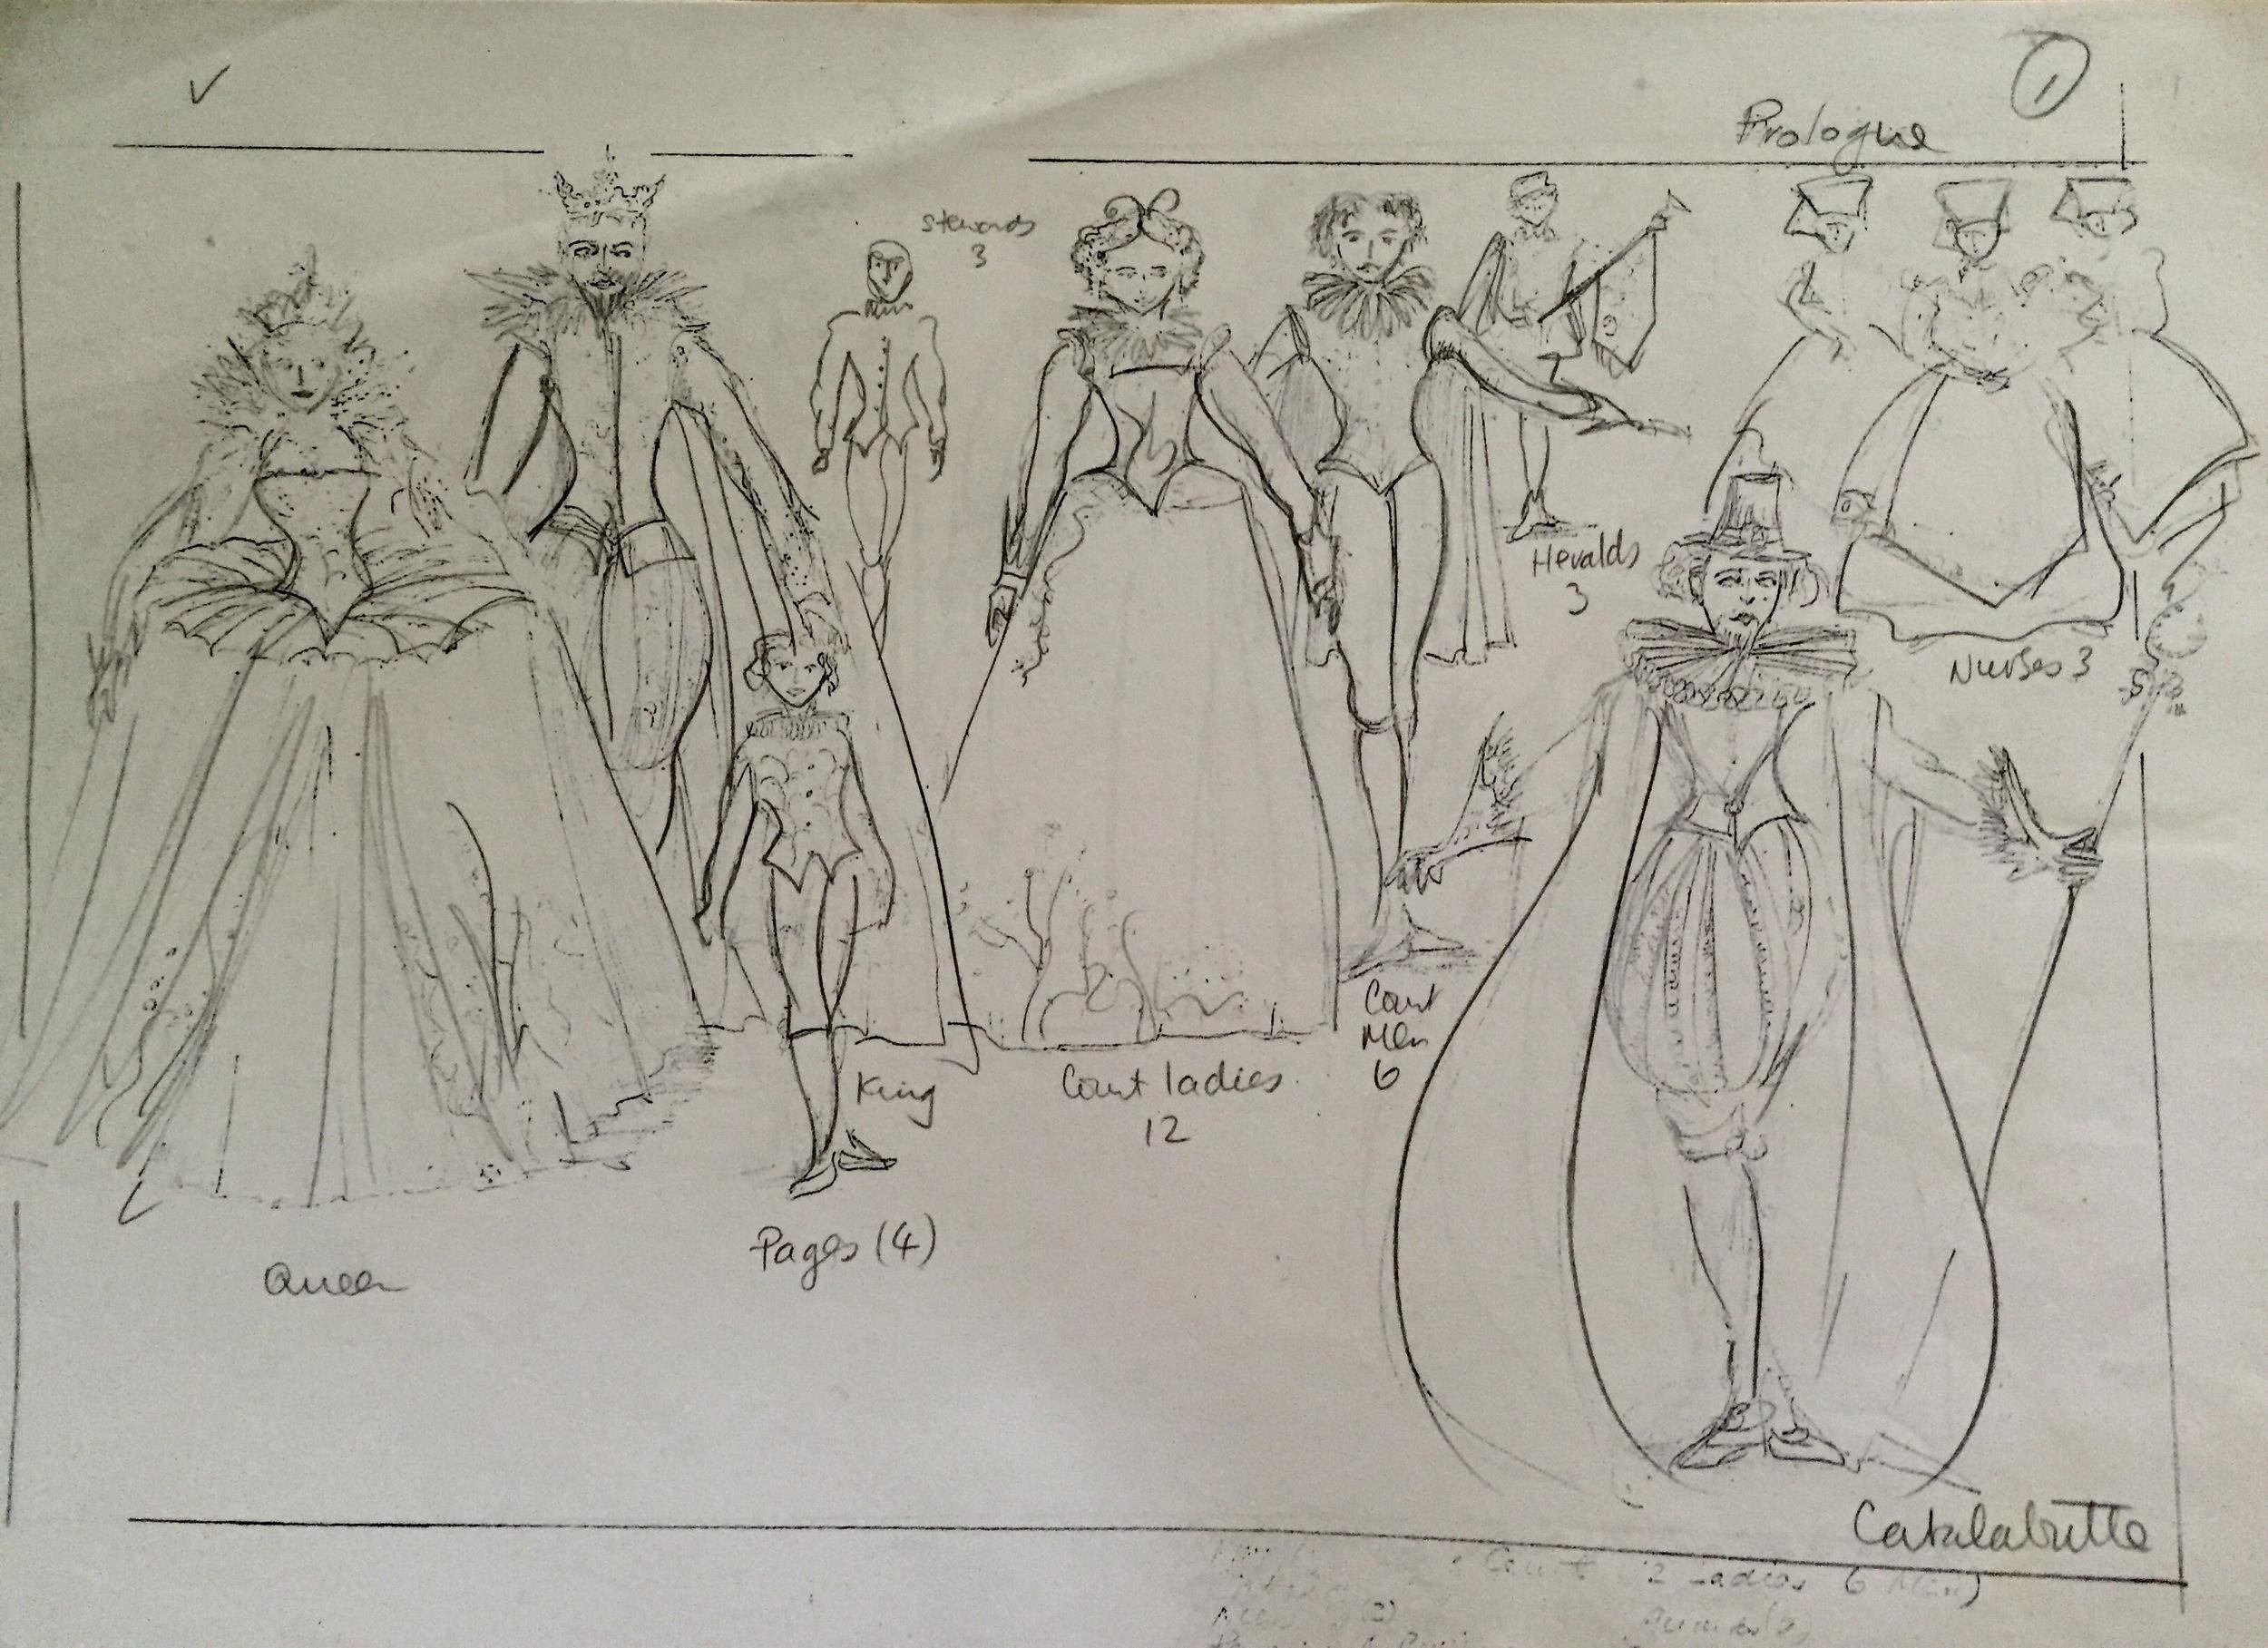 Sleeping Beauty ballet - producction design - David Roger 4.jpg